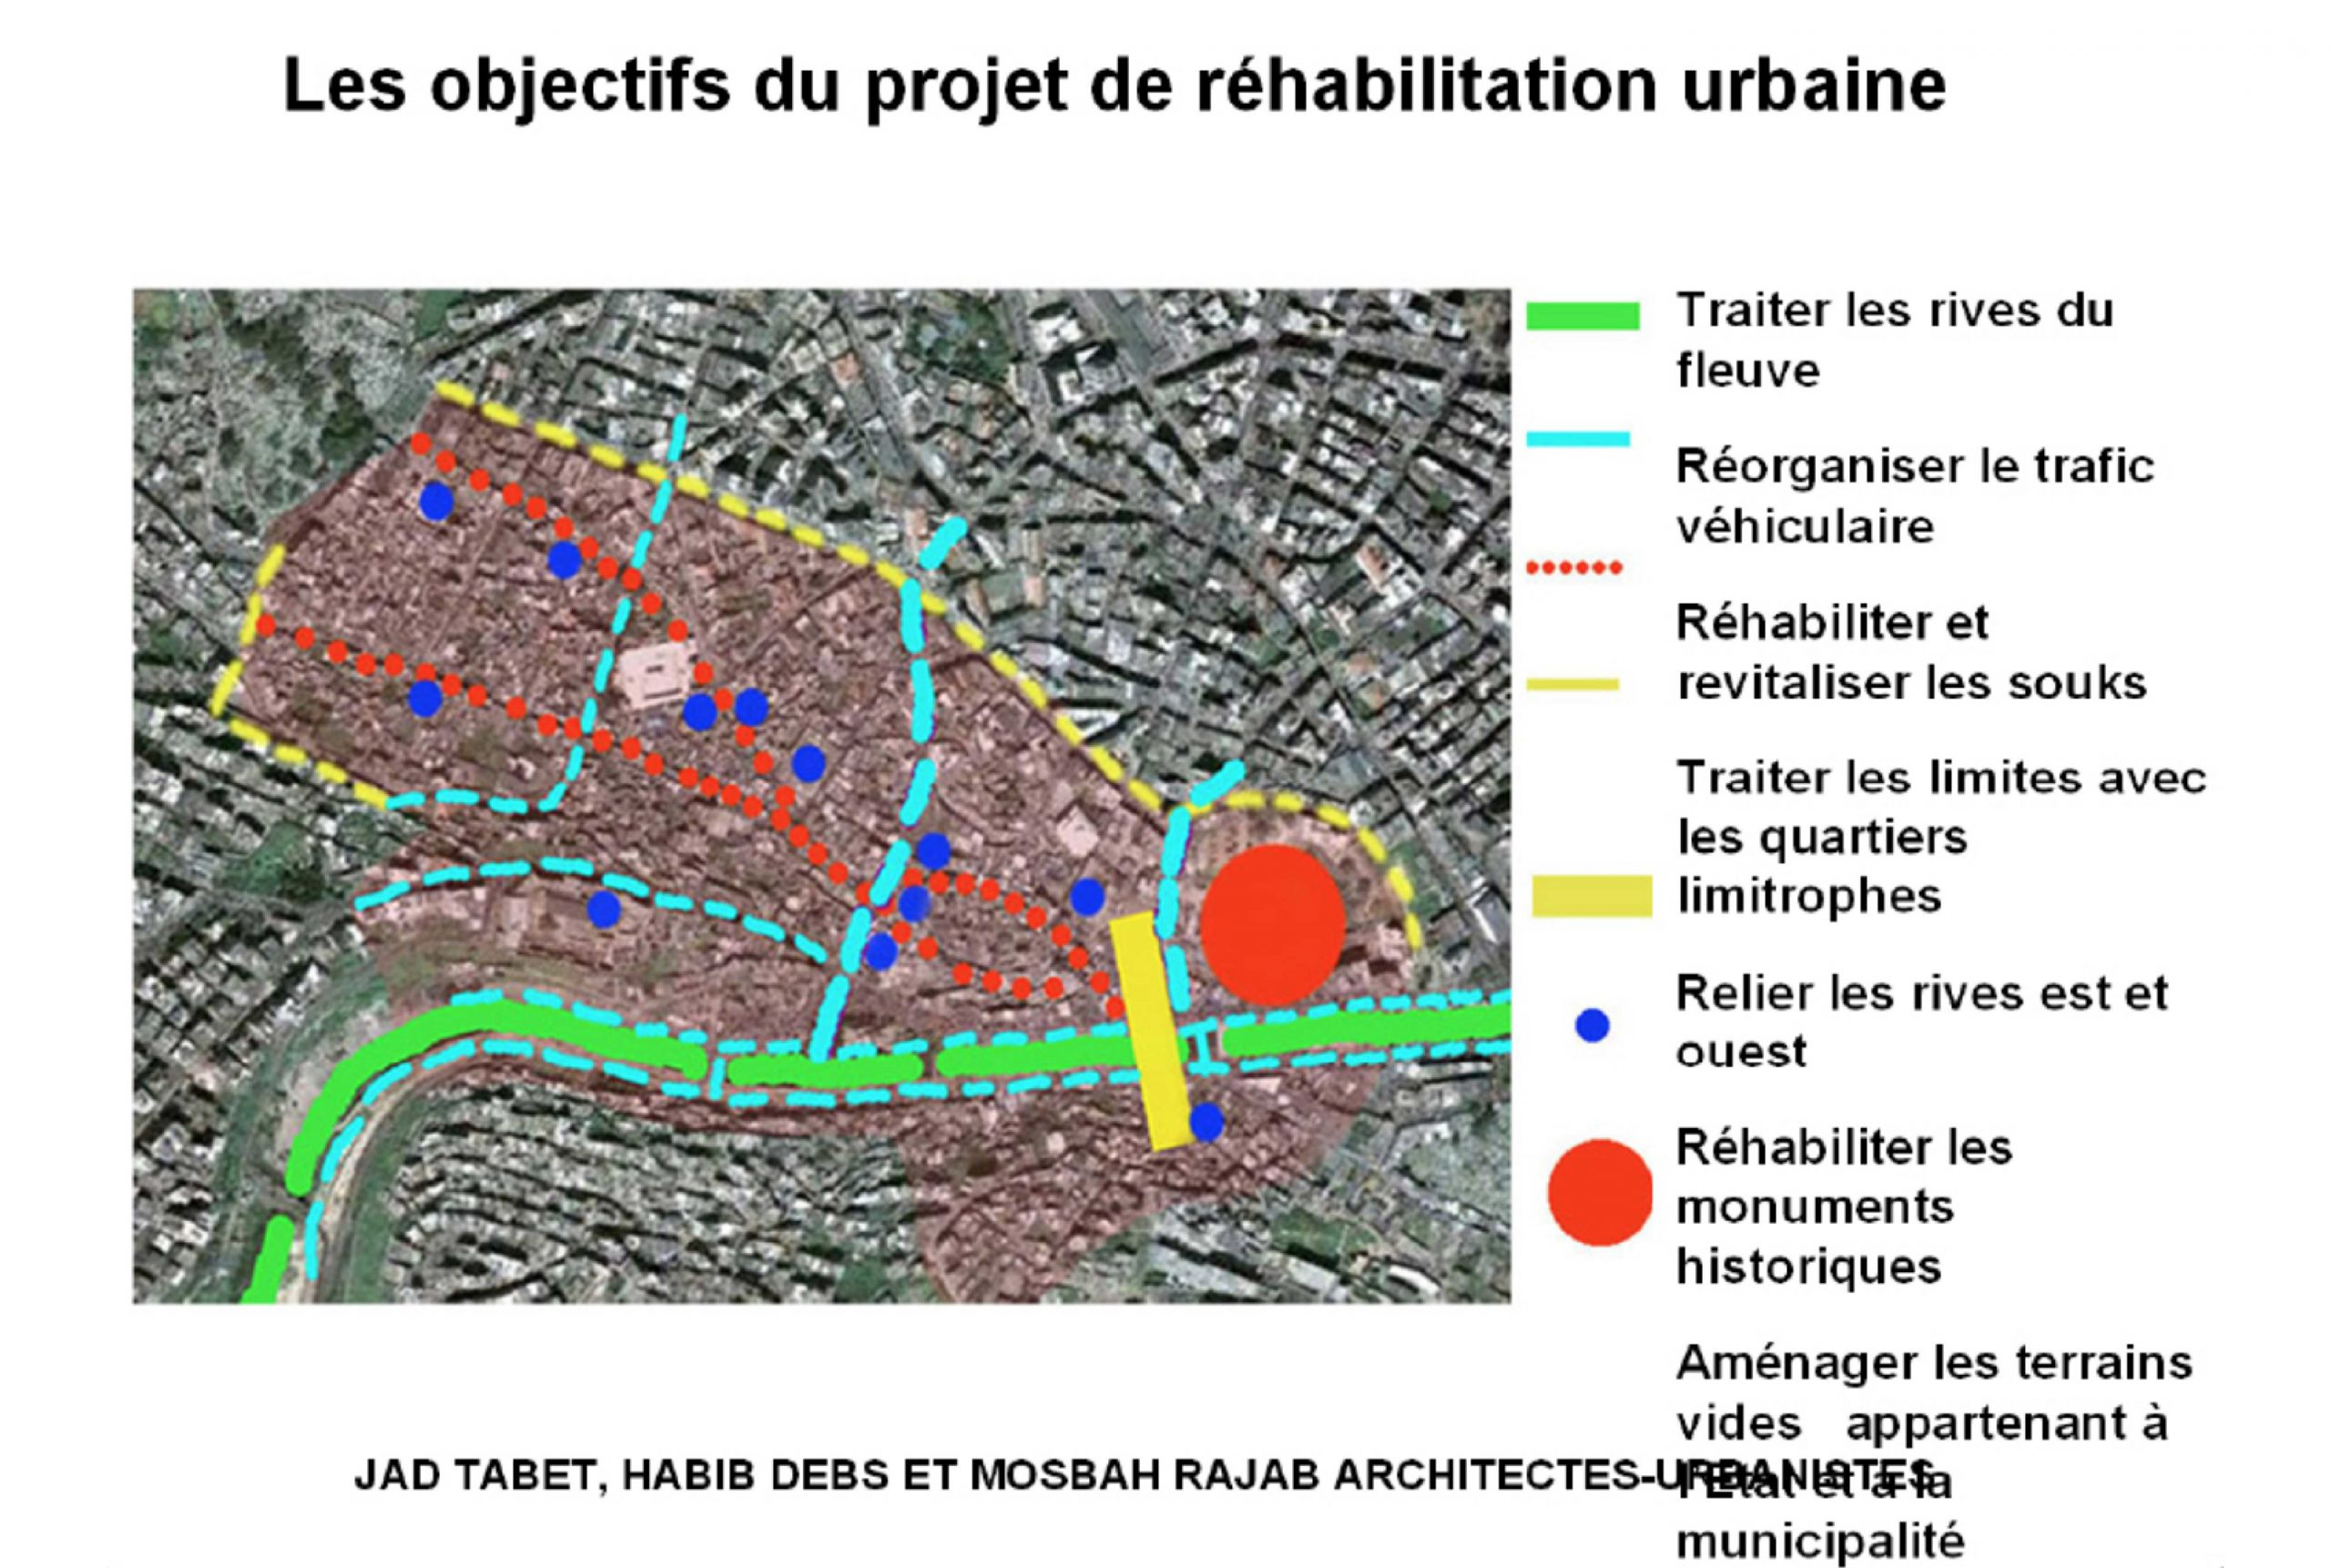 Projet urbanisme Tripoli 4 par Atelier JS Tabet